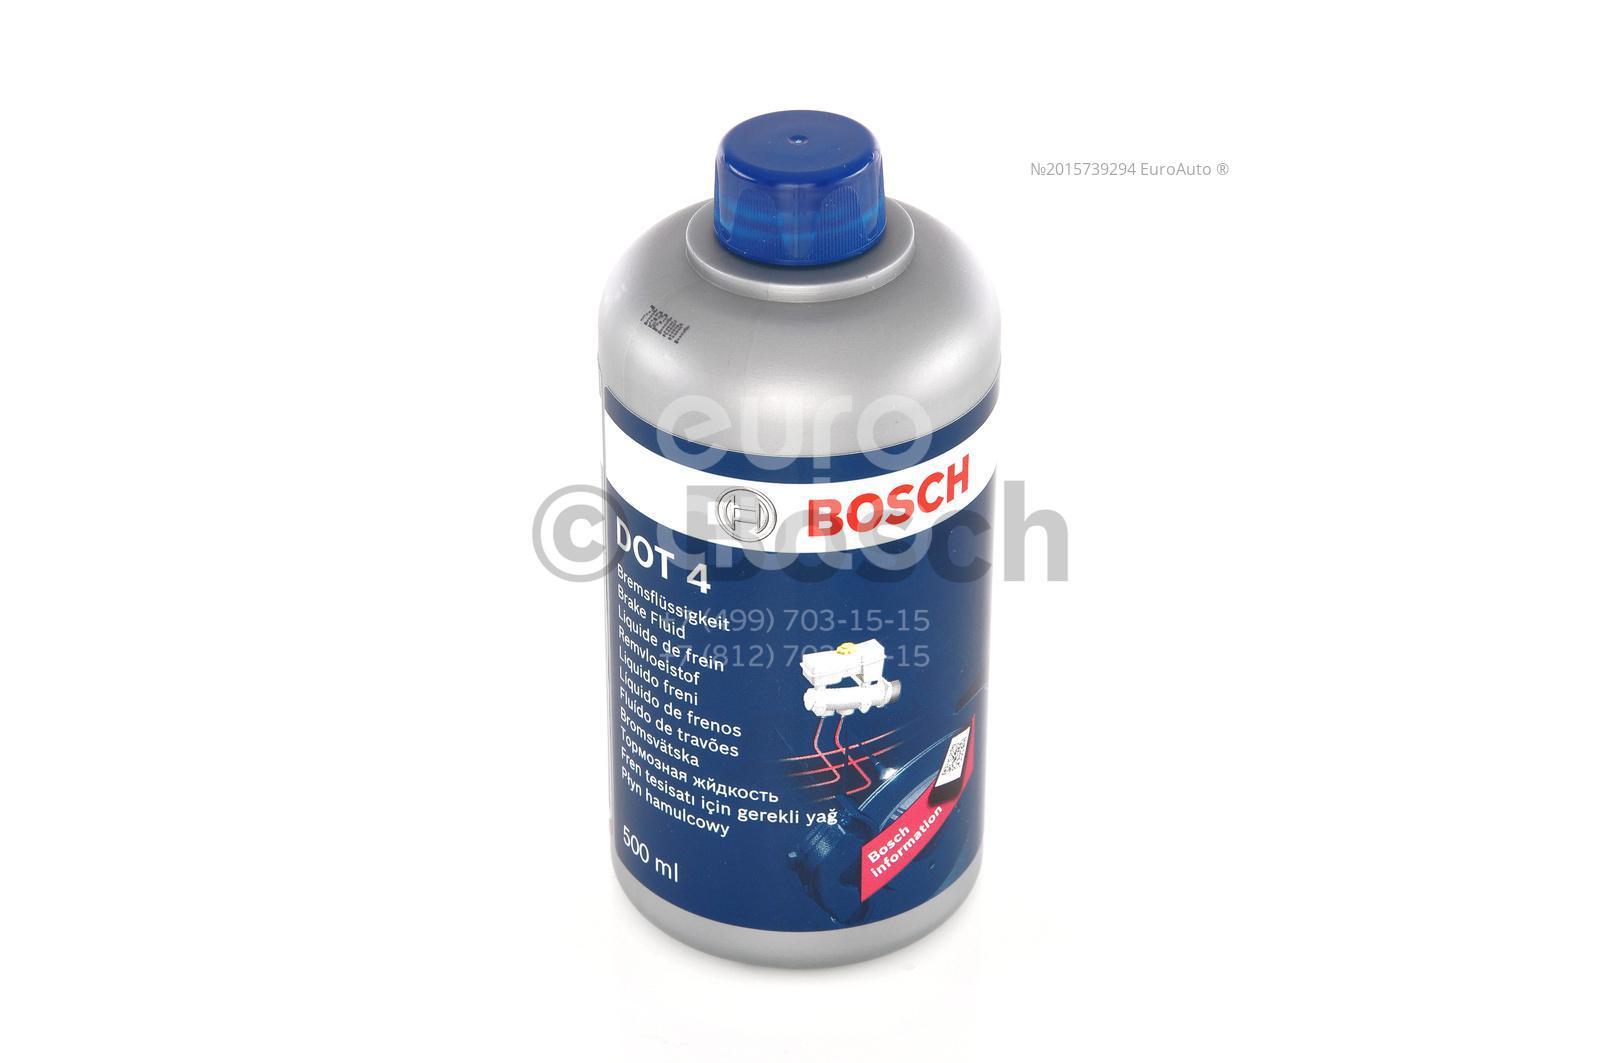 Жидкость тормозная DOT-4 0.5L/ FENOX, METACO 455 ГР. - Фото №1